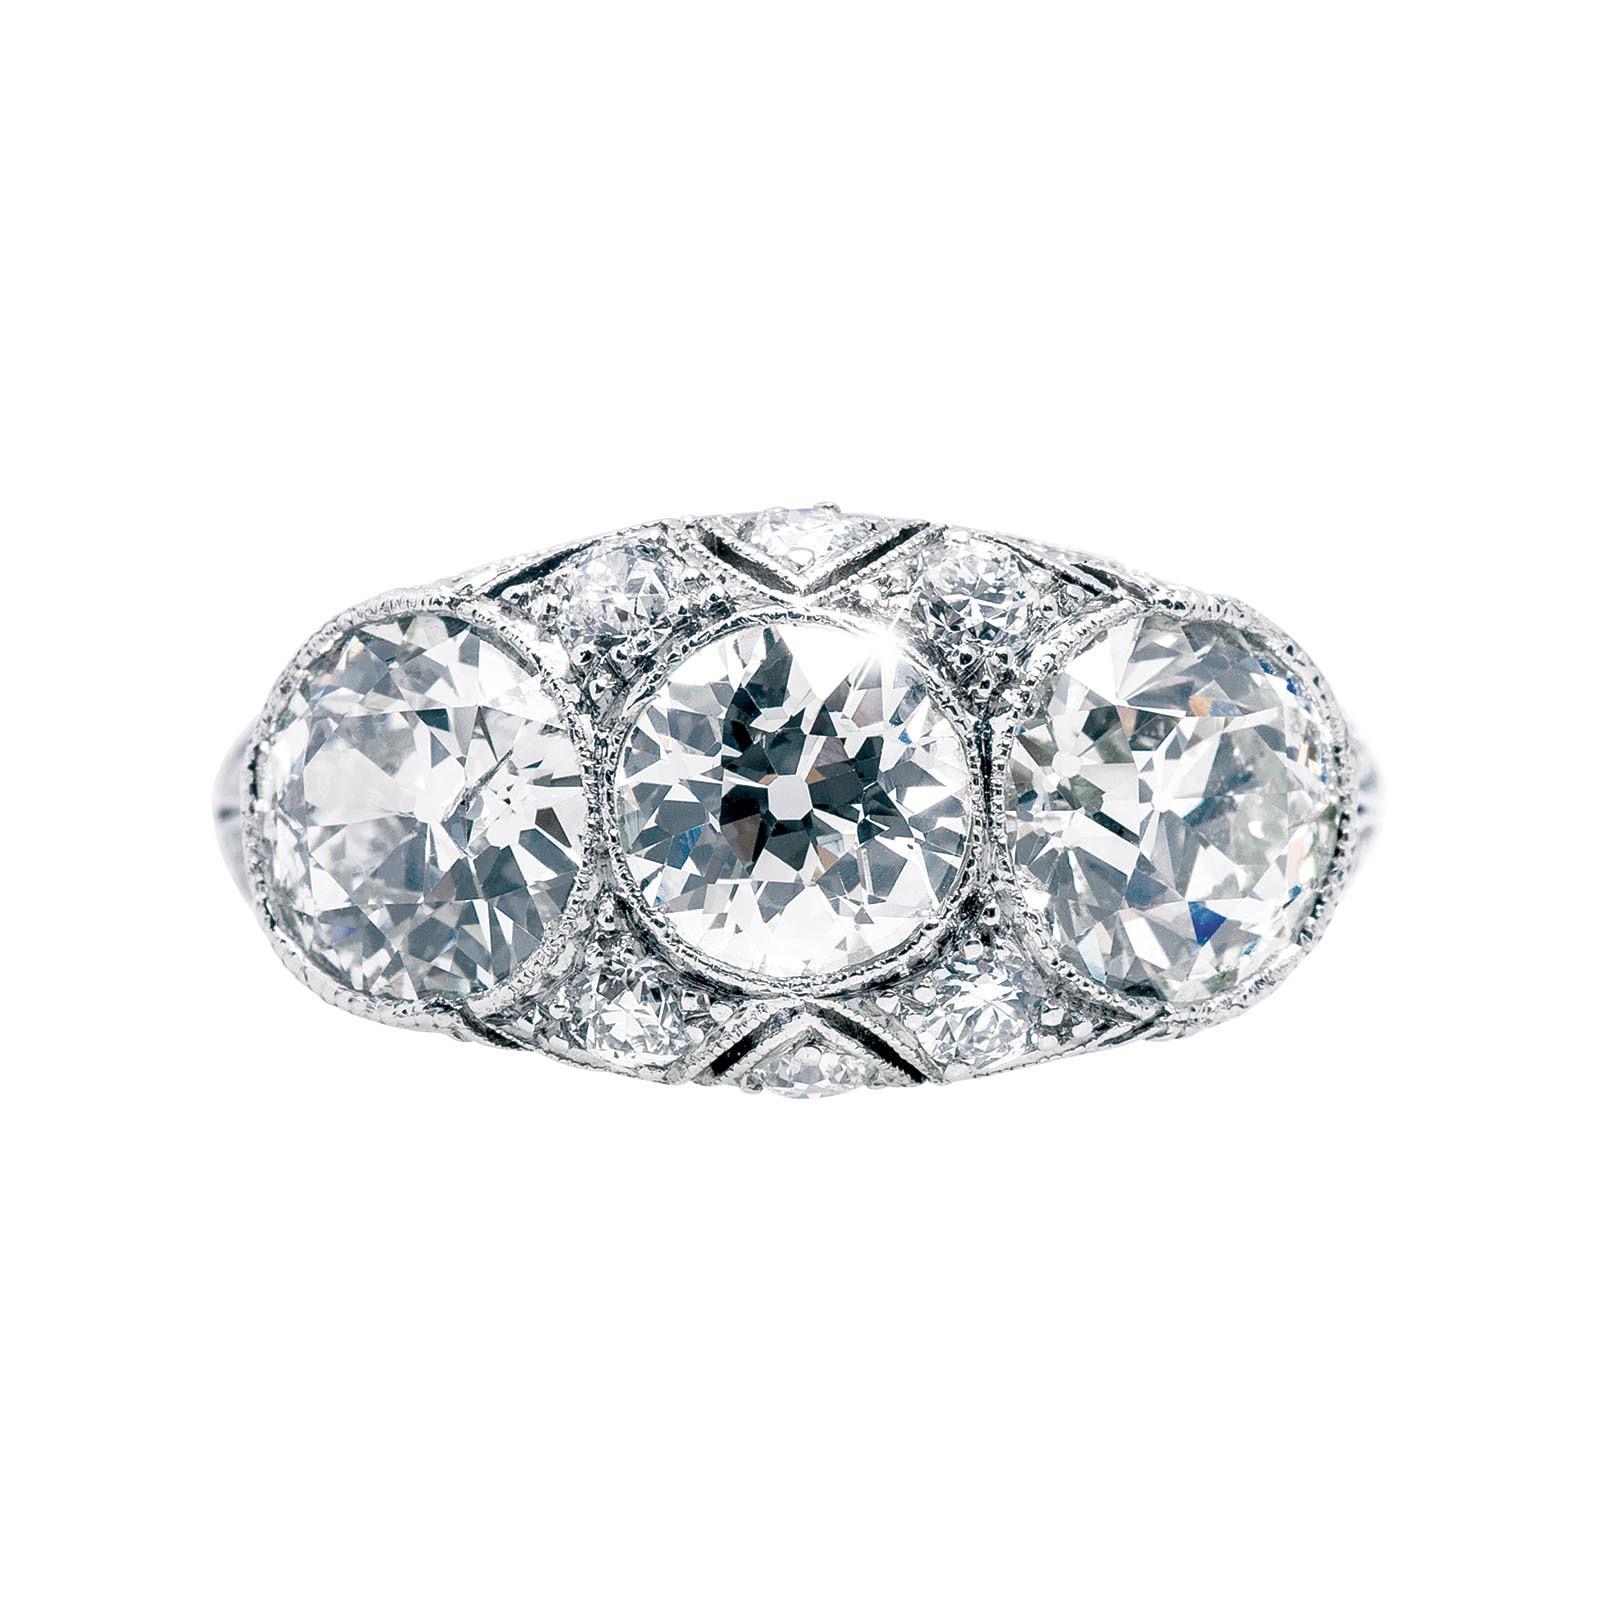 Antique Edwardian 2.92 CTW Diamond Engagement Ring